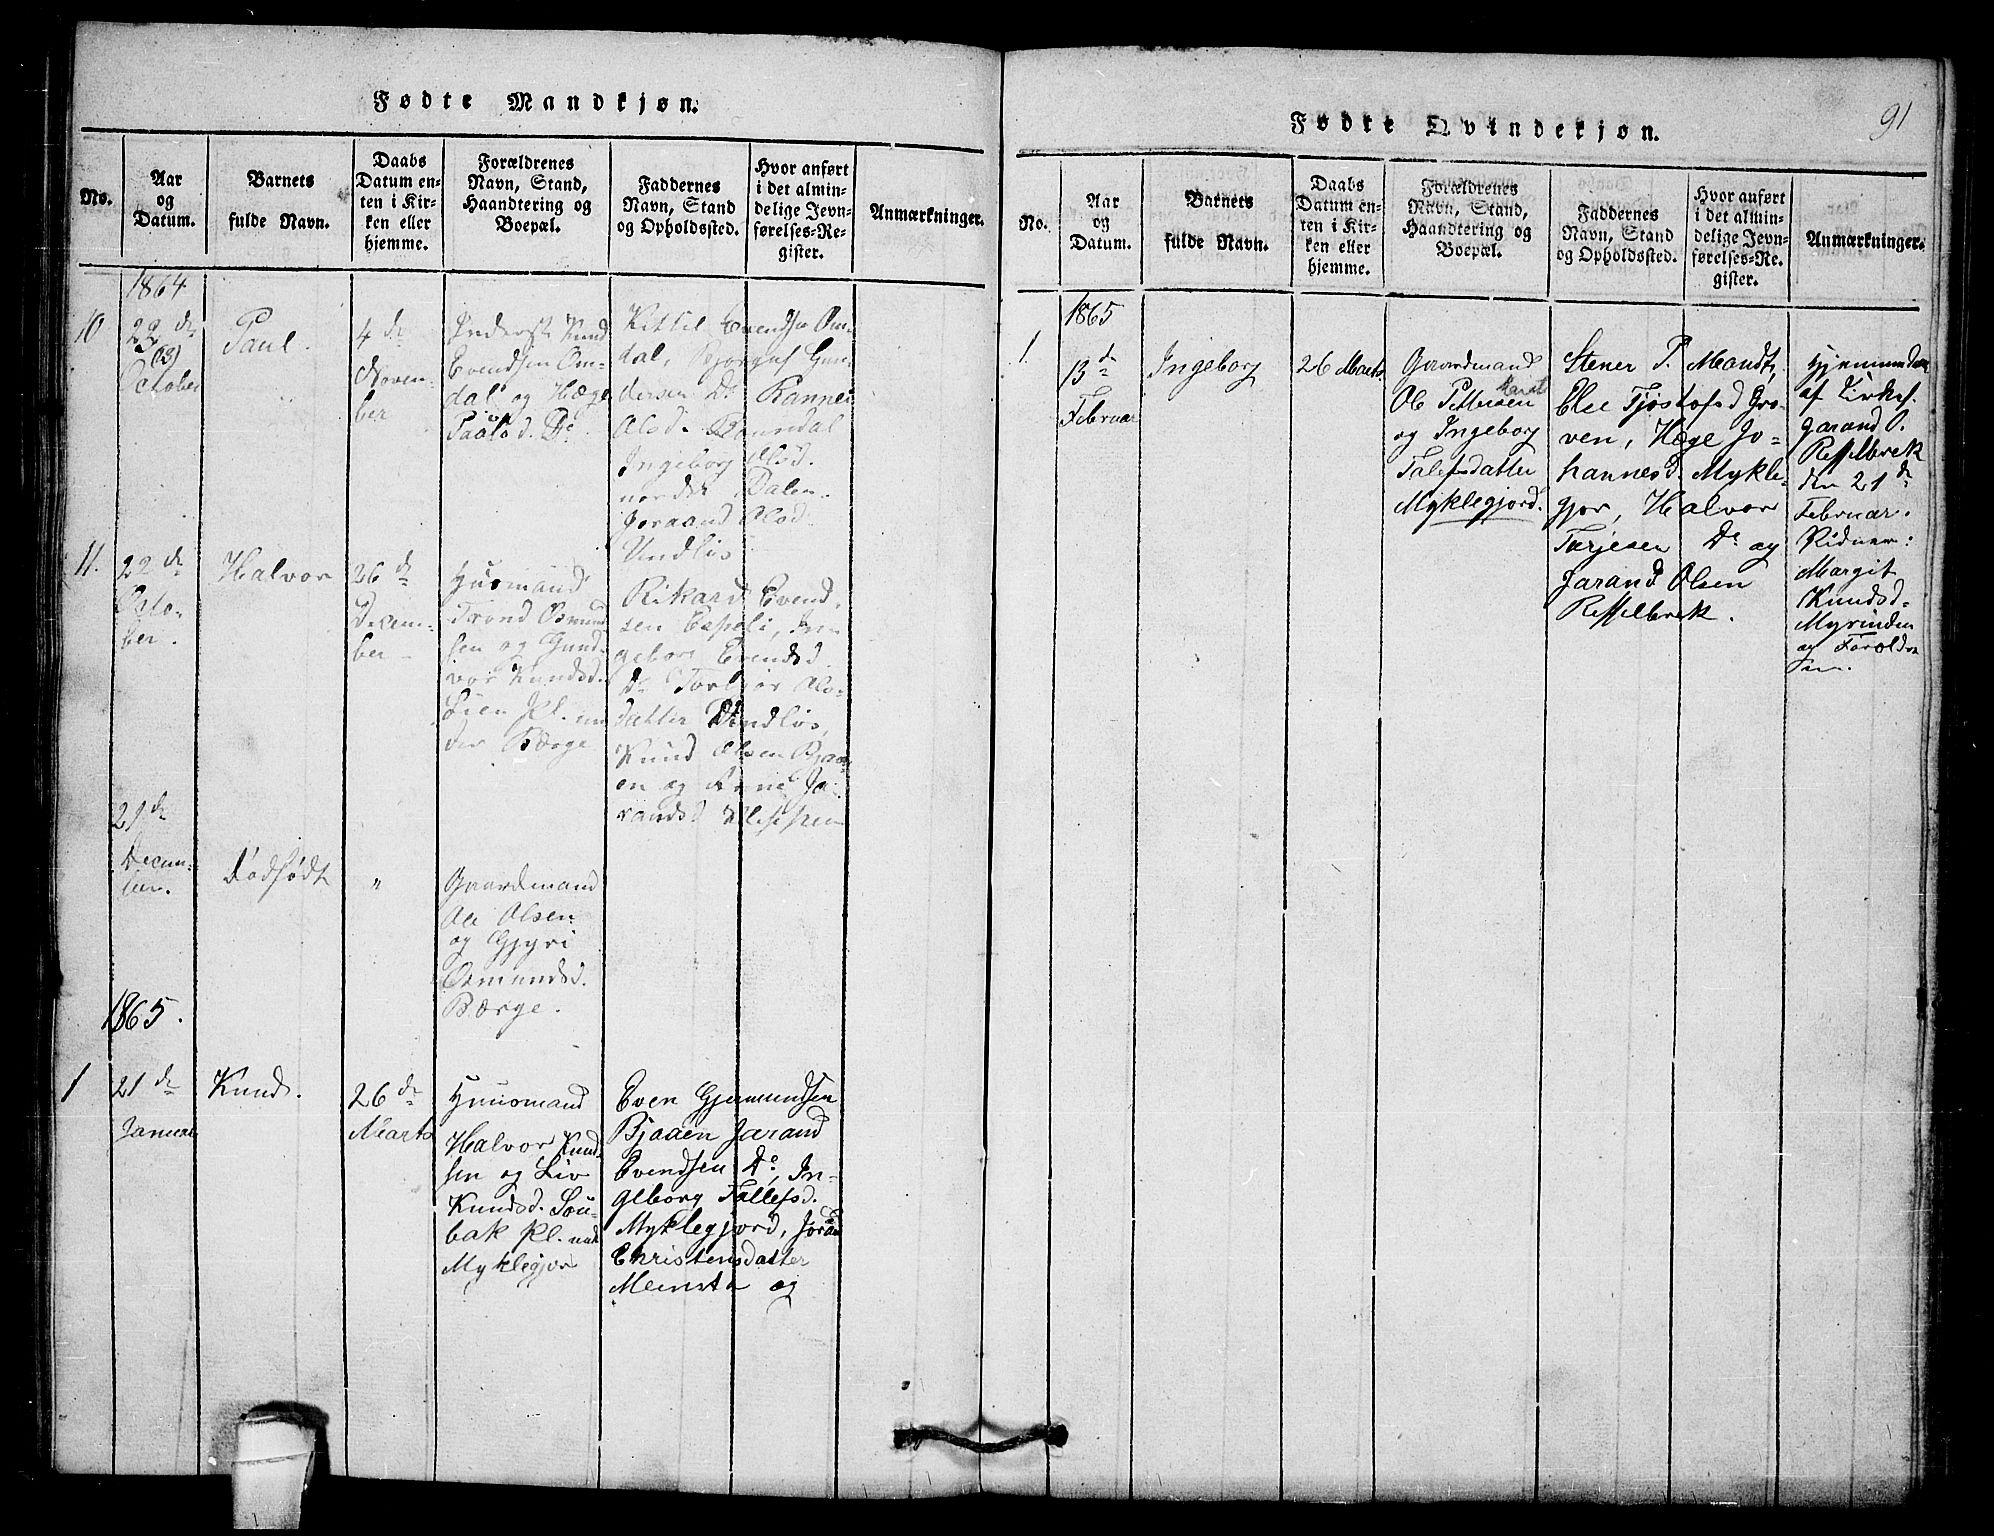 SAKO, Lårdal kirkebøker, G/Gb/L0001: Klokkerbok nr. II 1, 1815-1865, s. 91